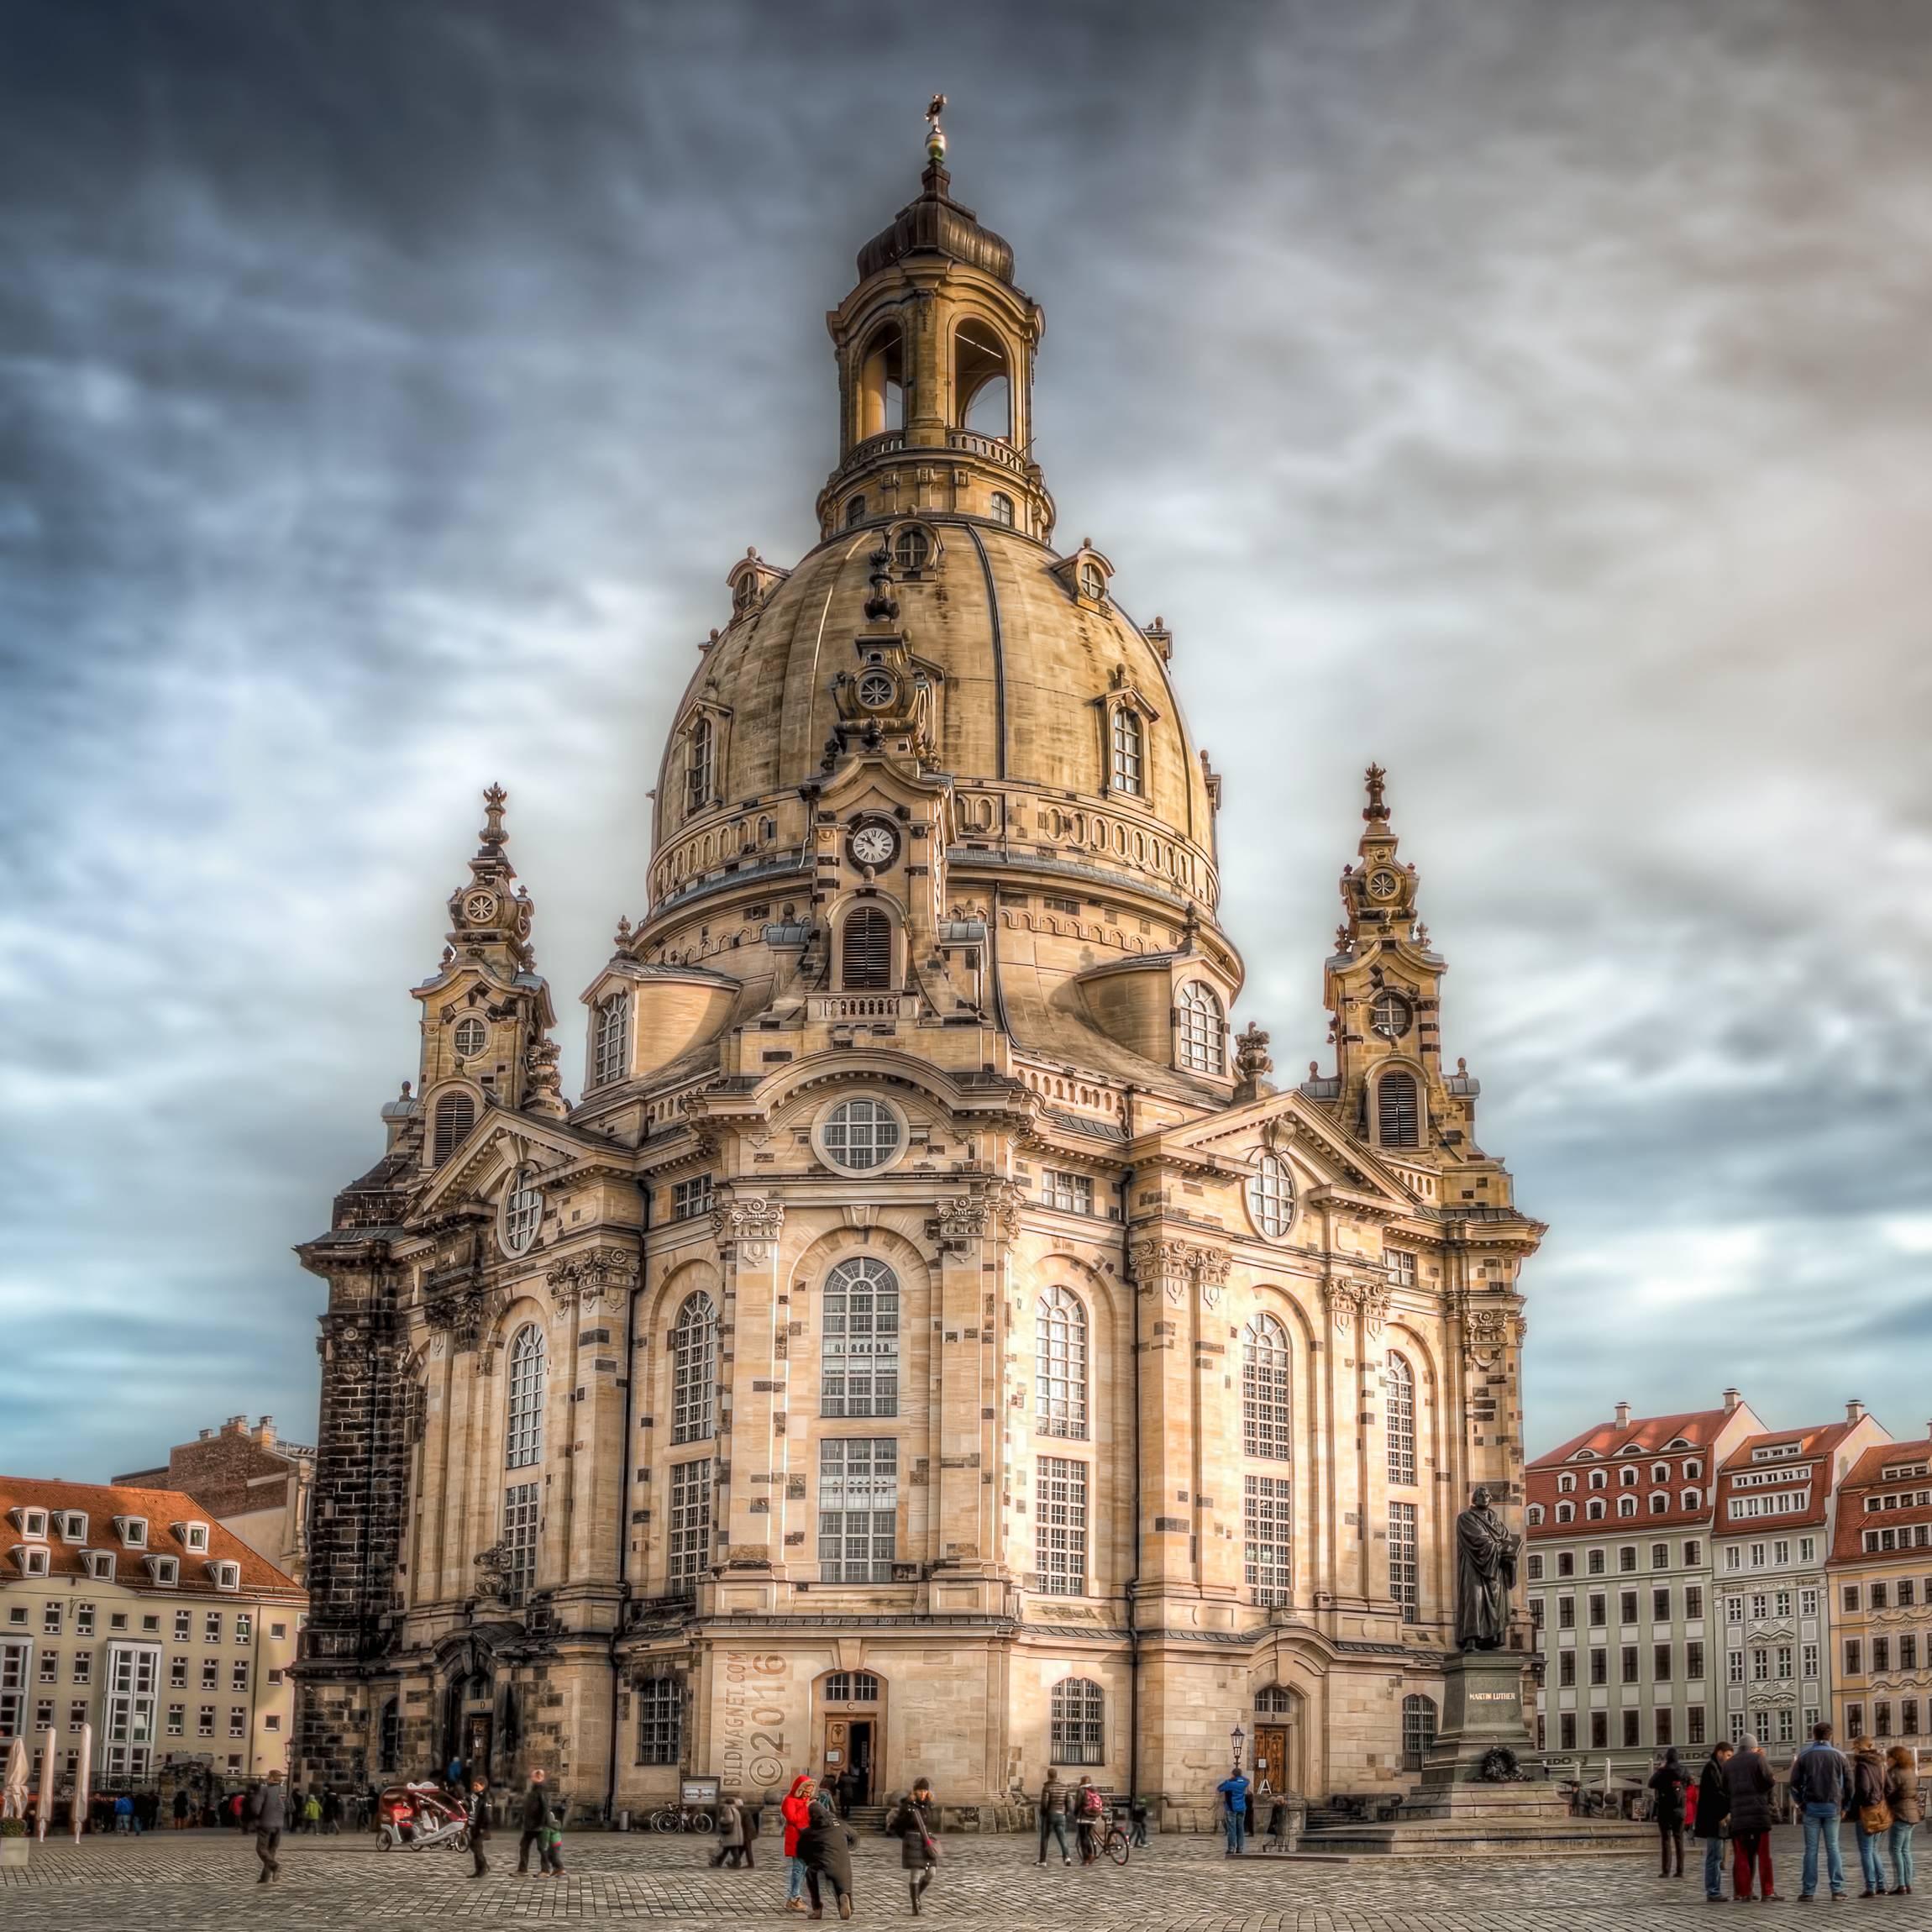 Дрезден за один день: маршрут прогулки по историческому центру